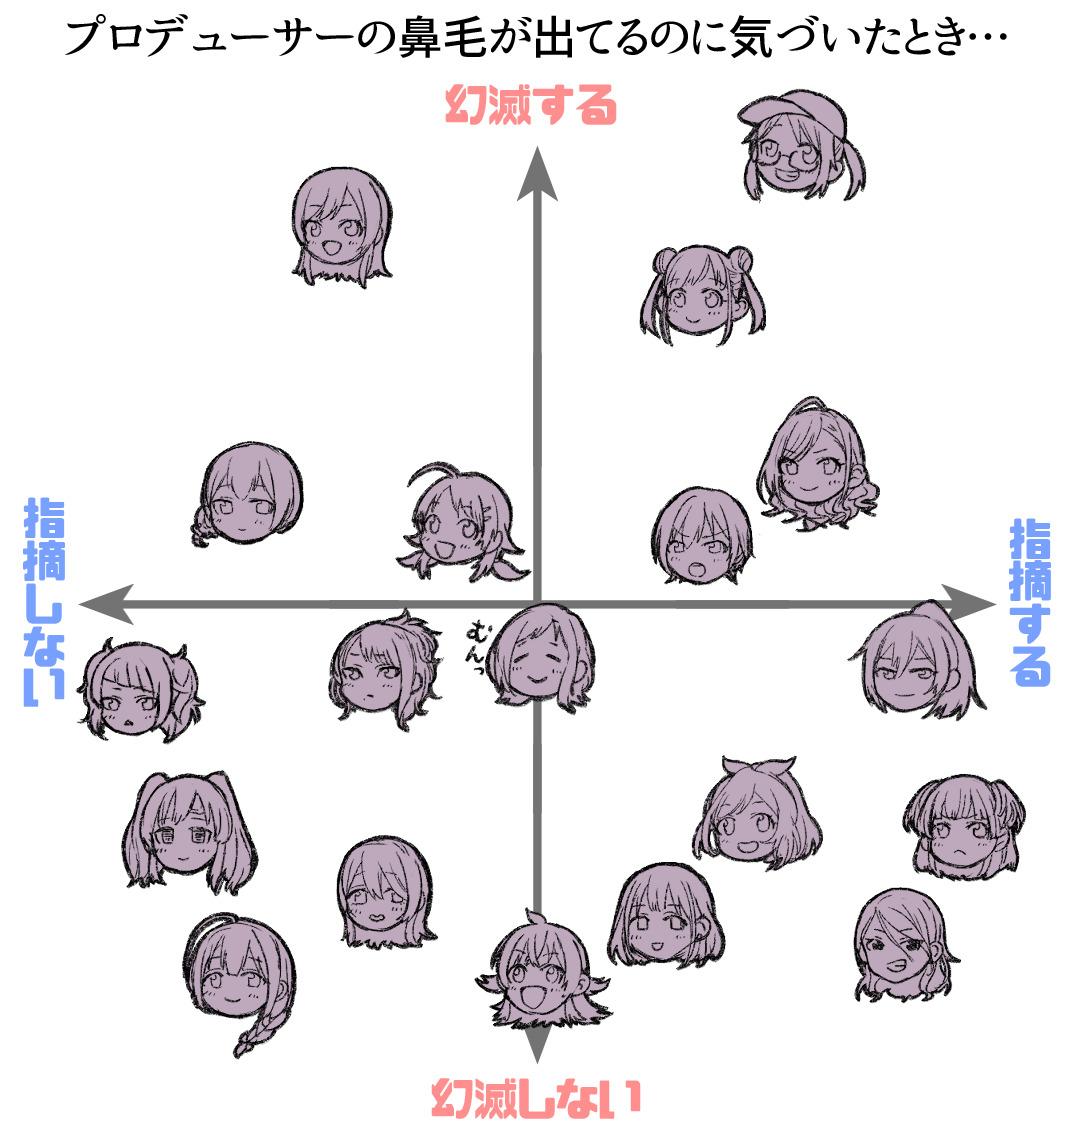 f:id:hoshi_sano:20200414110331j:image:w400